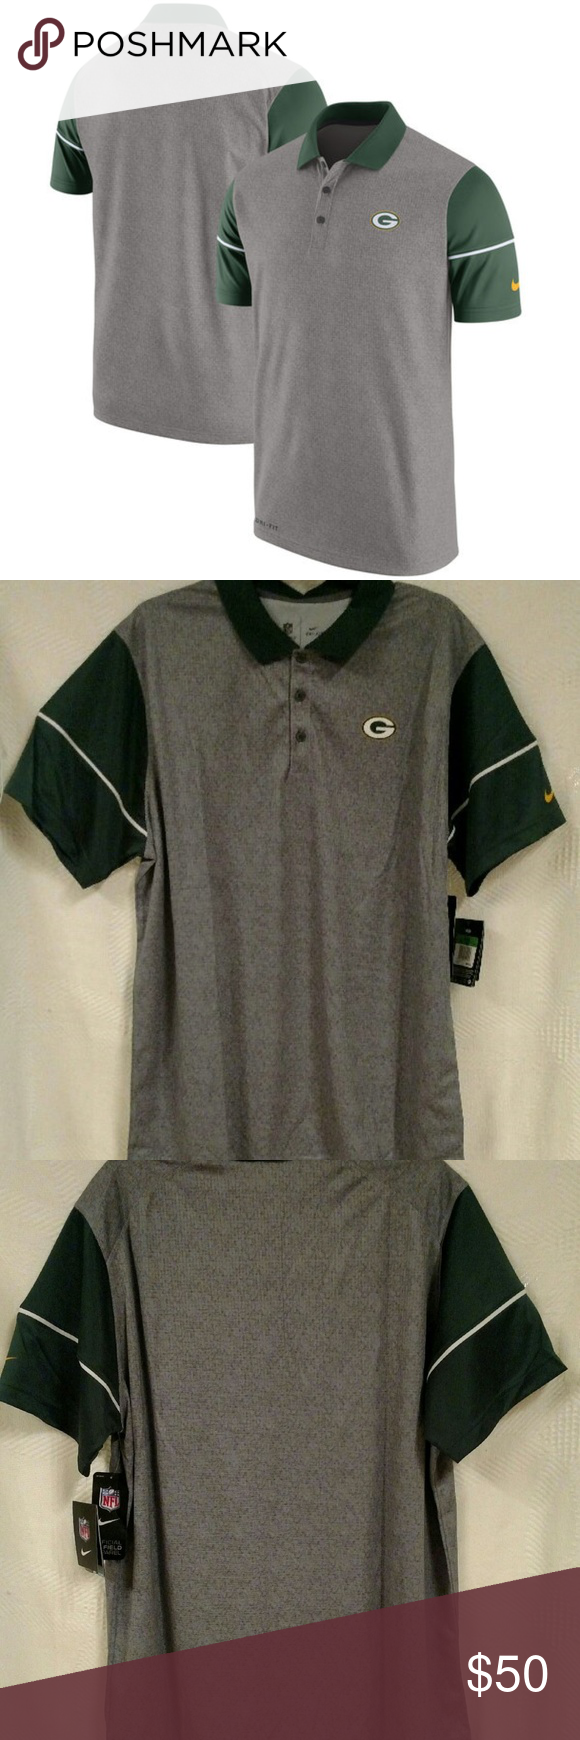 Green Bay Packers Womens Polo Shirts Lauren Goss